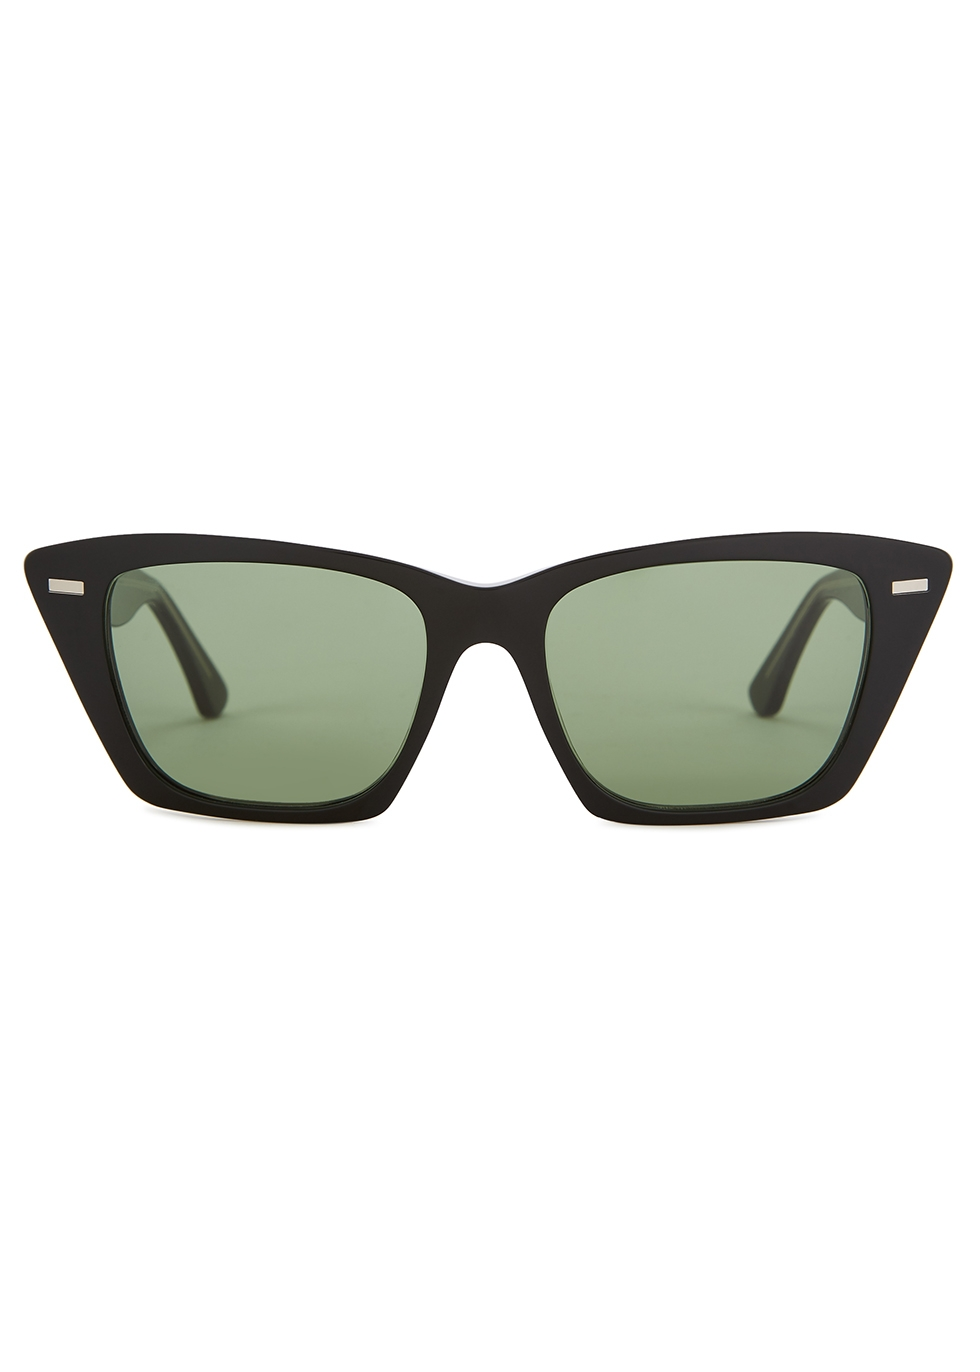 Ingridh black cat-eye sunglasses - Acne Studios